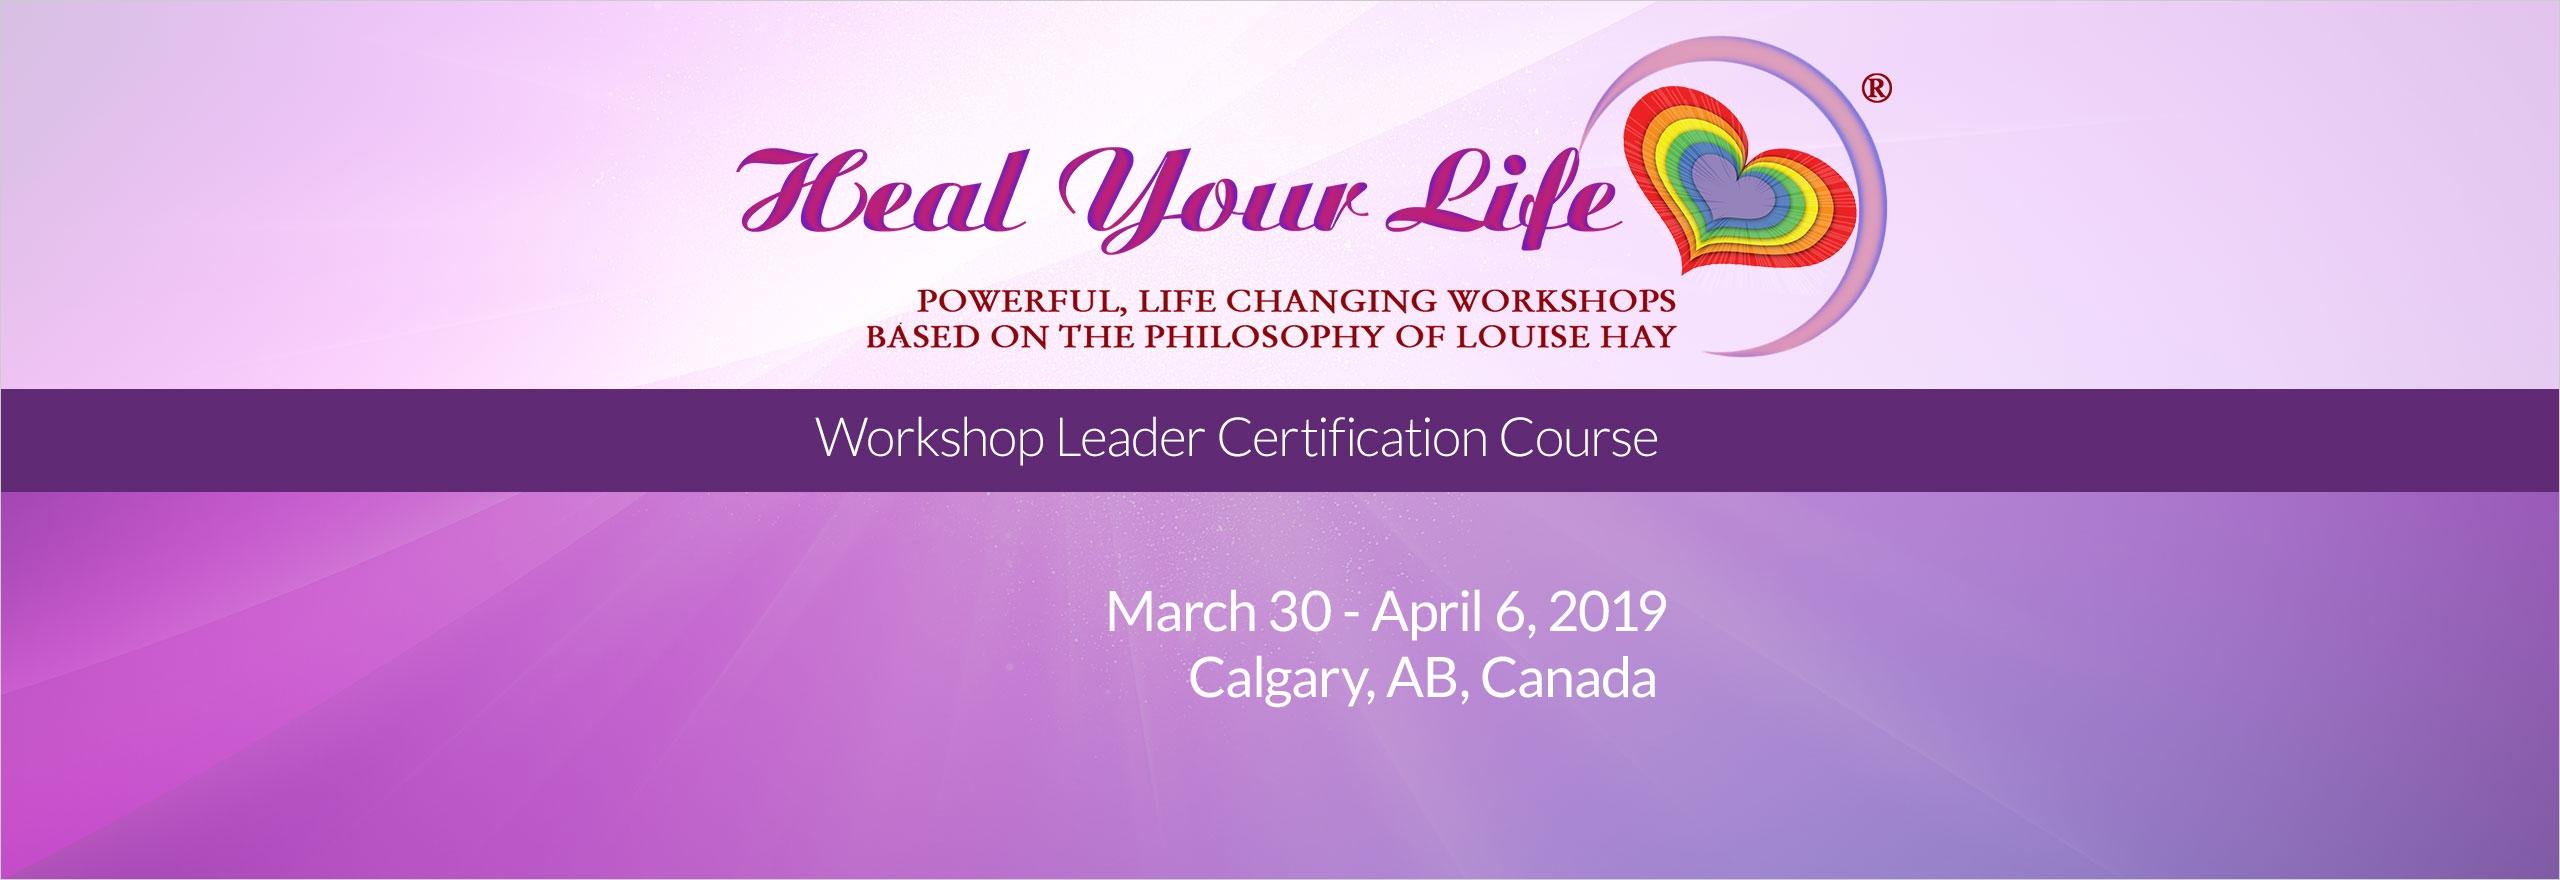 Heal Your Life Workshop Leader Training - Calgary, AB, Canada